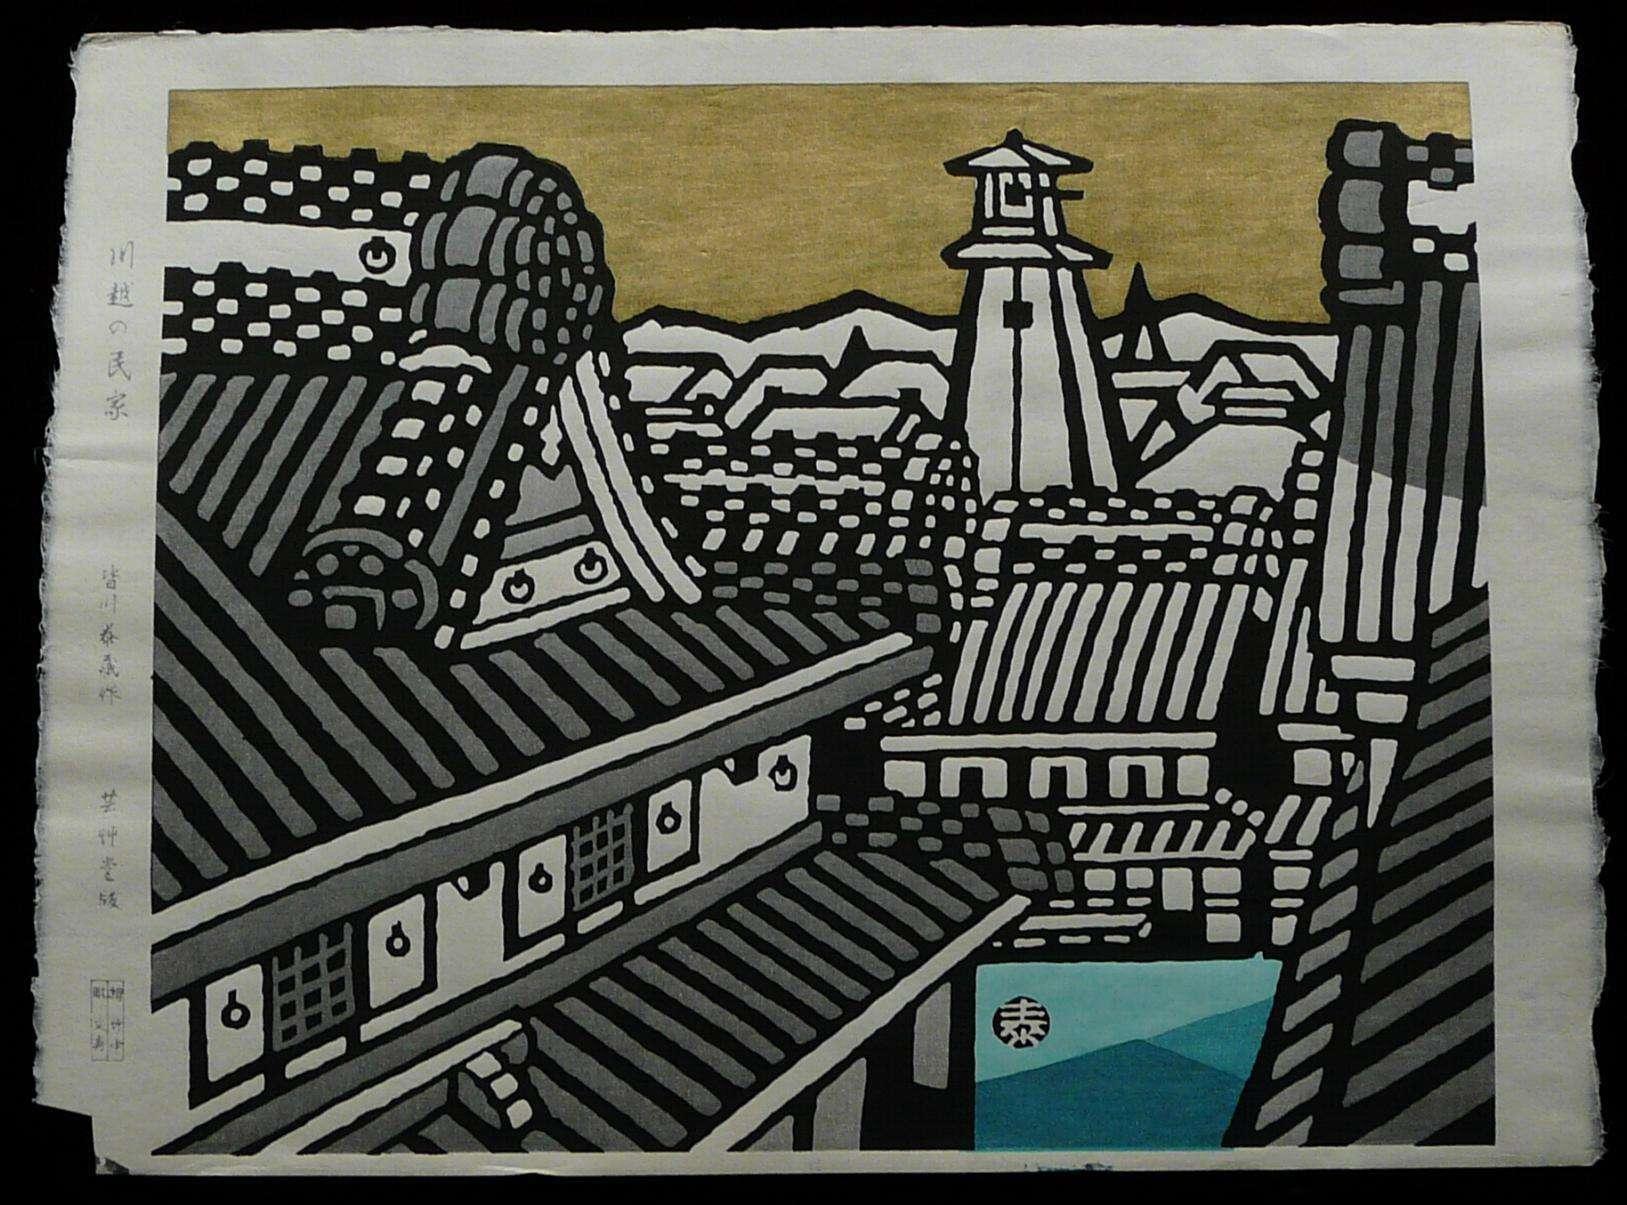 TAIZO MINAGAWA: #P2922 BELL TOWER IN KAWAGOE, SATAMA